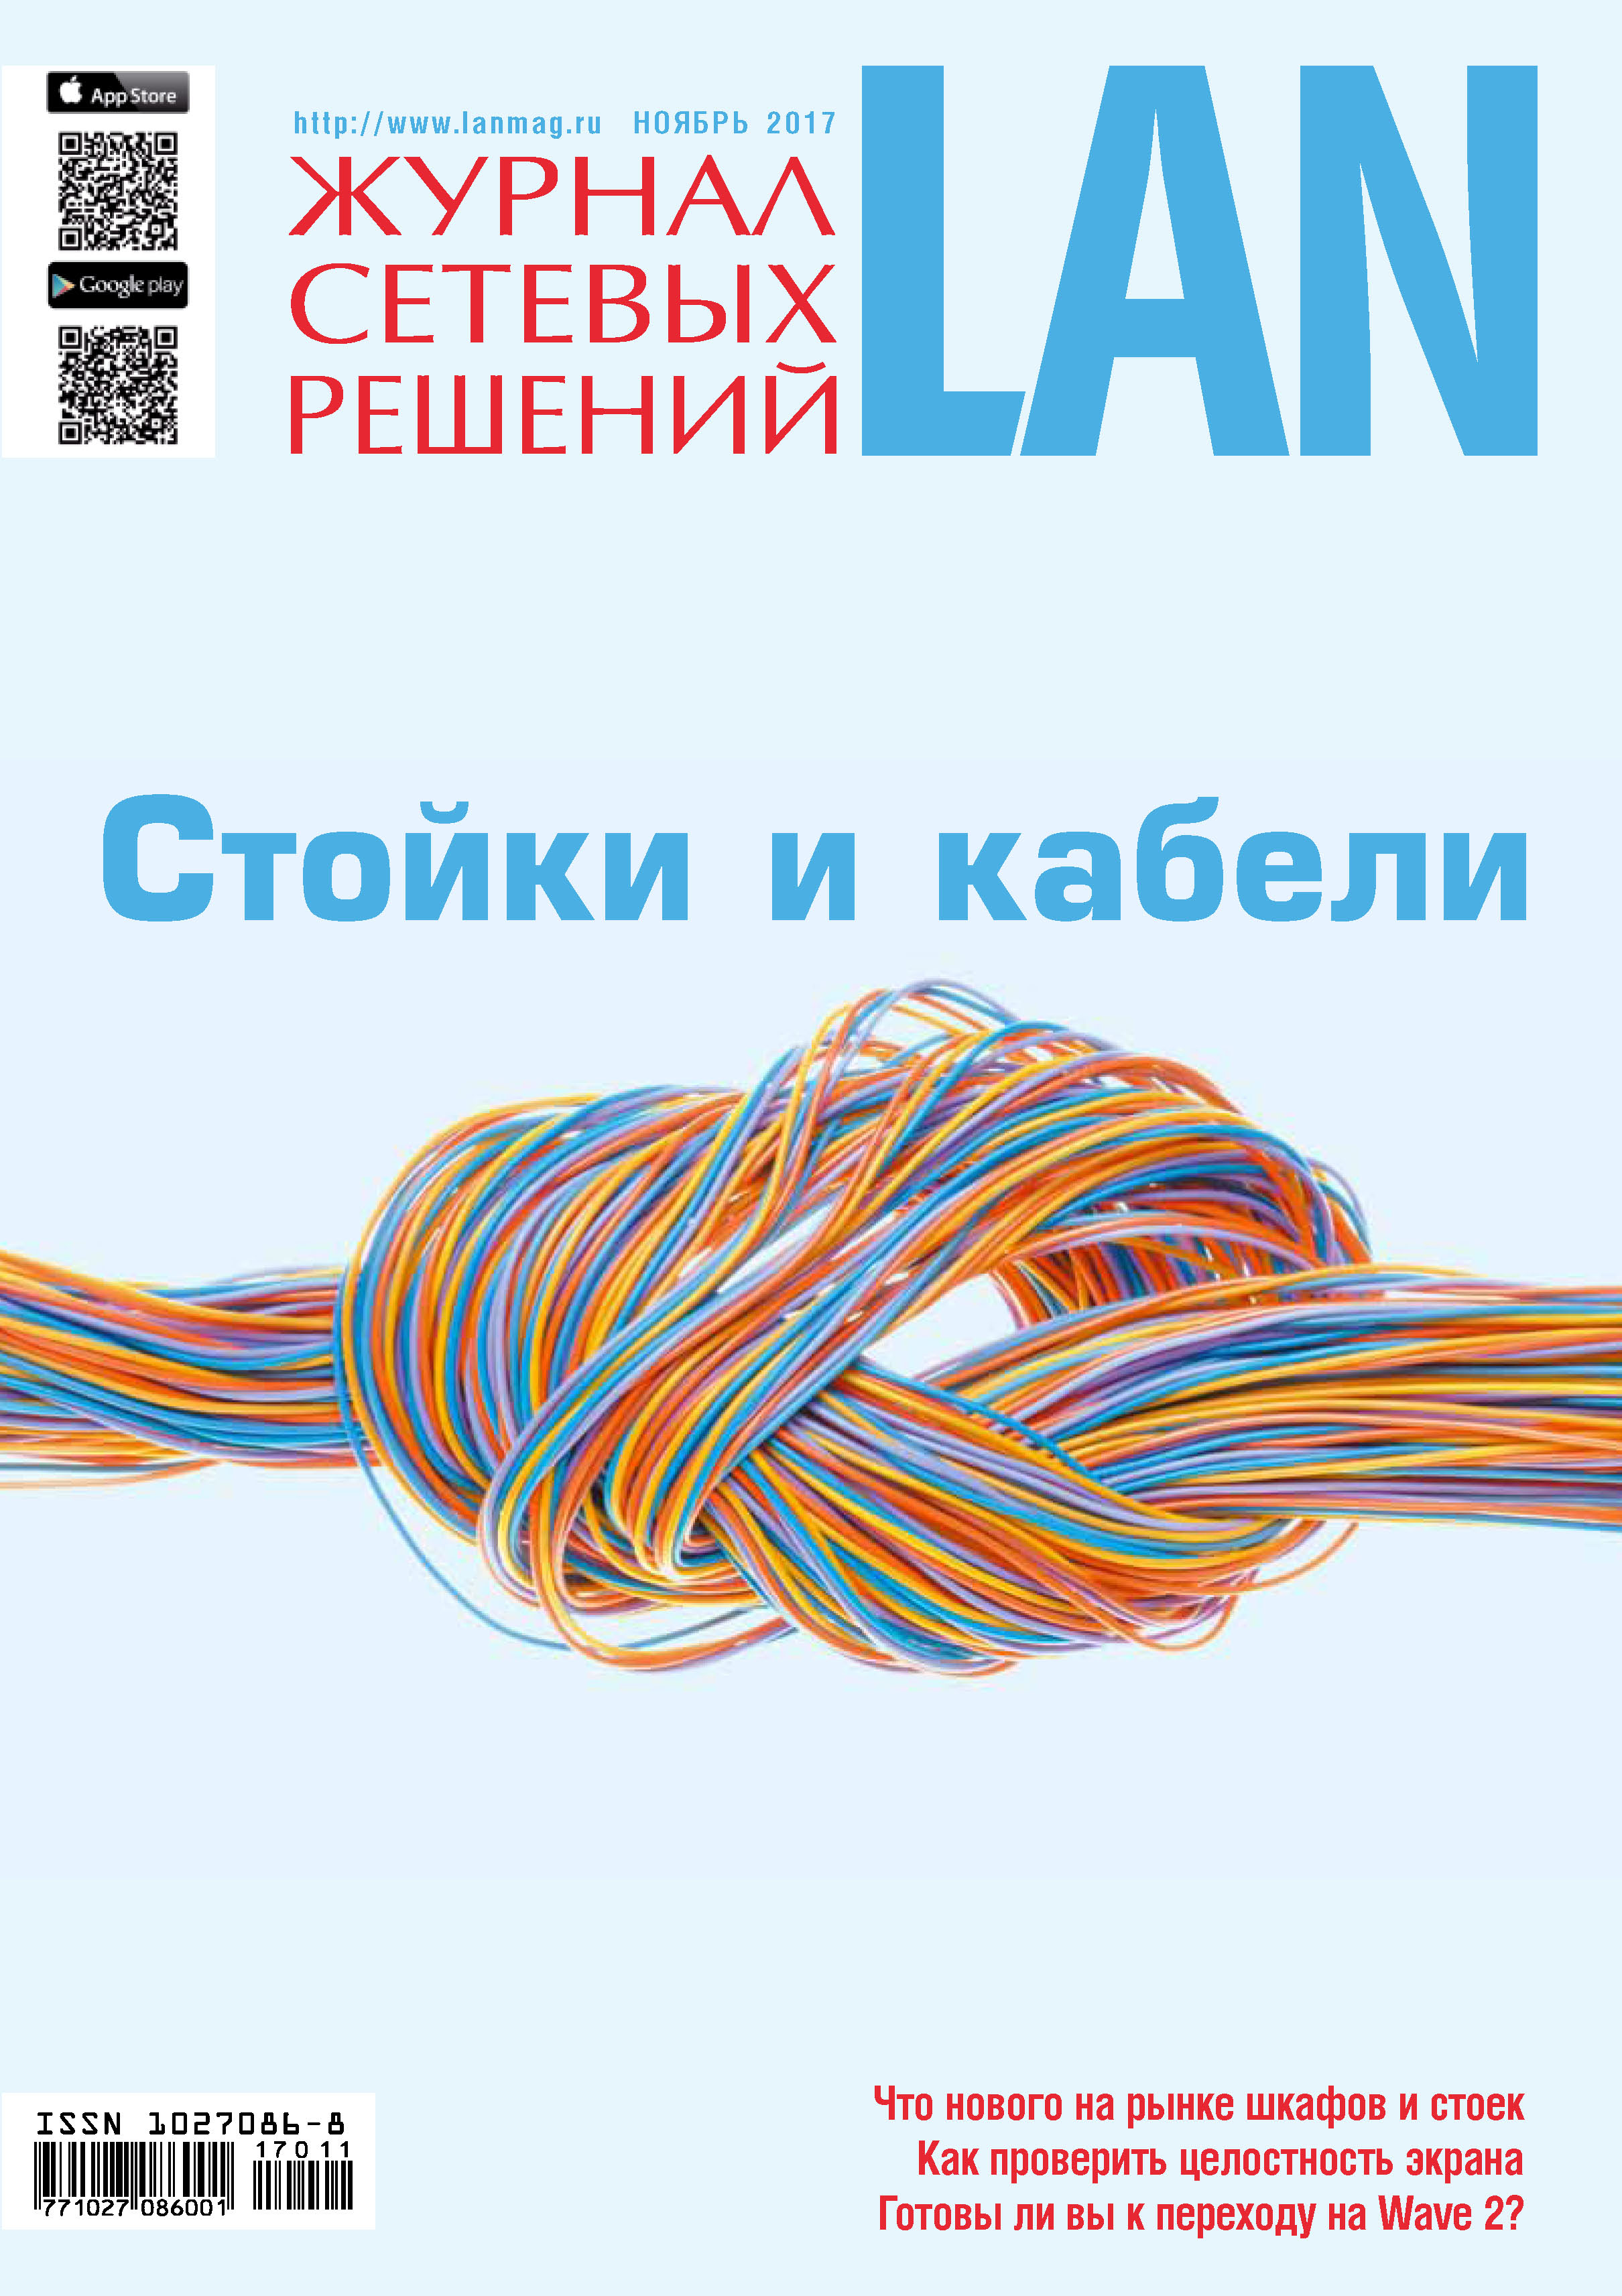 Журнал сетевых решений / LAN №11/2017